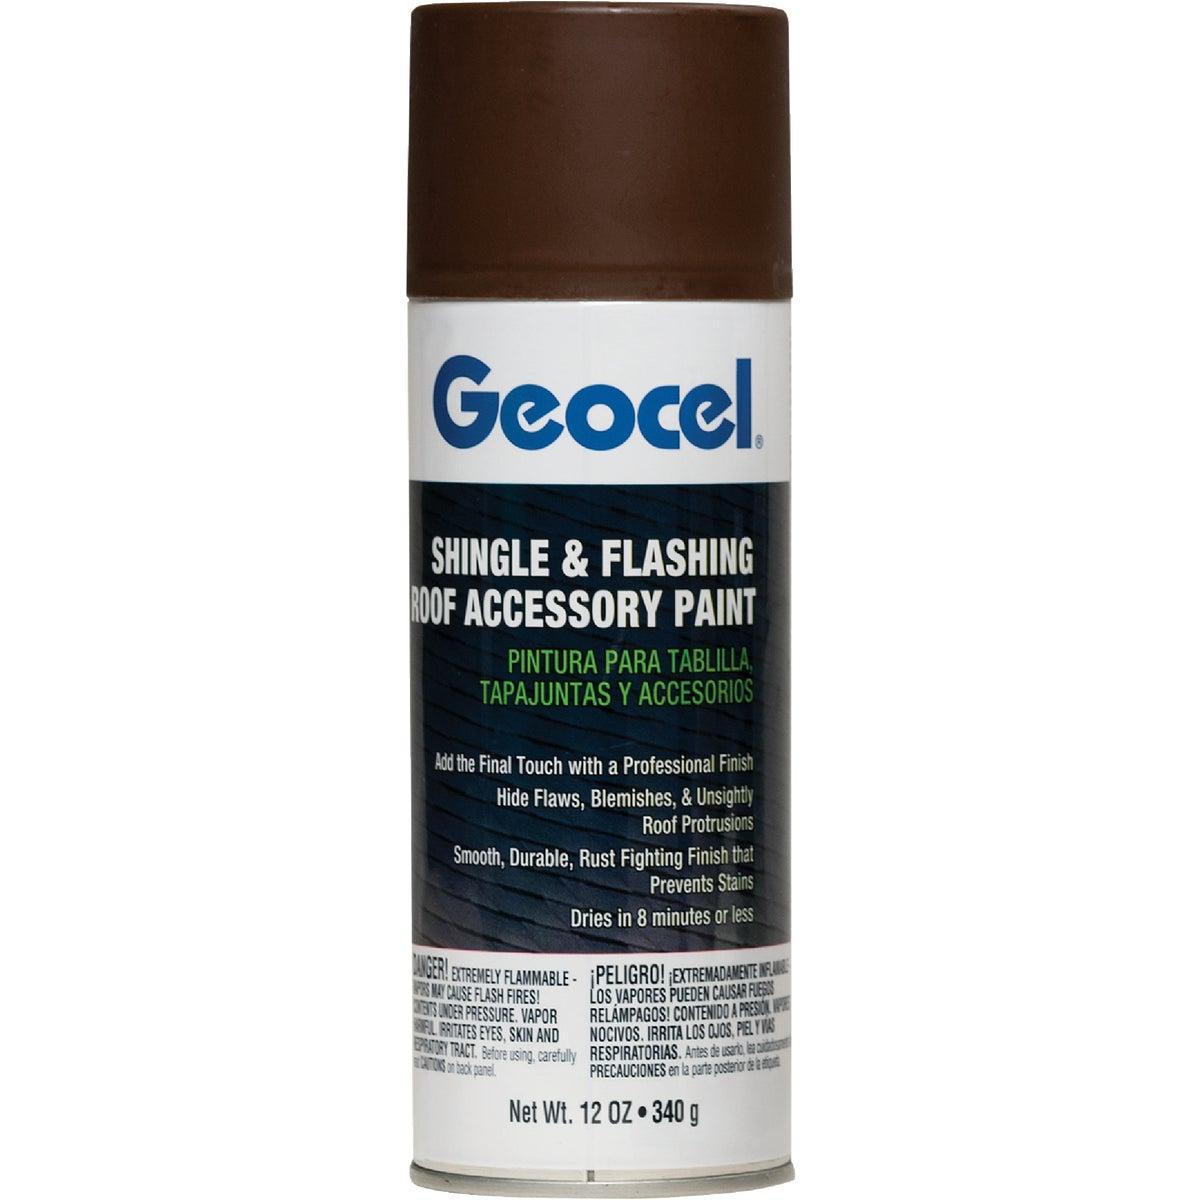 BROWN ROOF PAINT - GC91104 by Geocel Llc